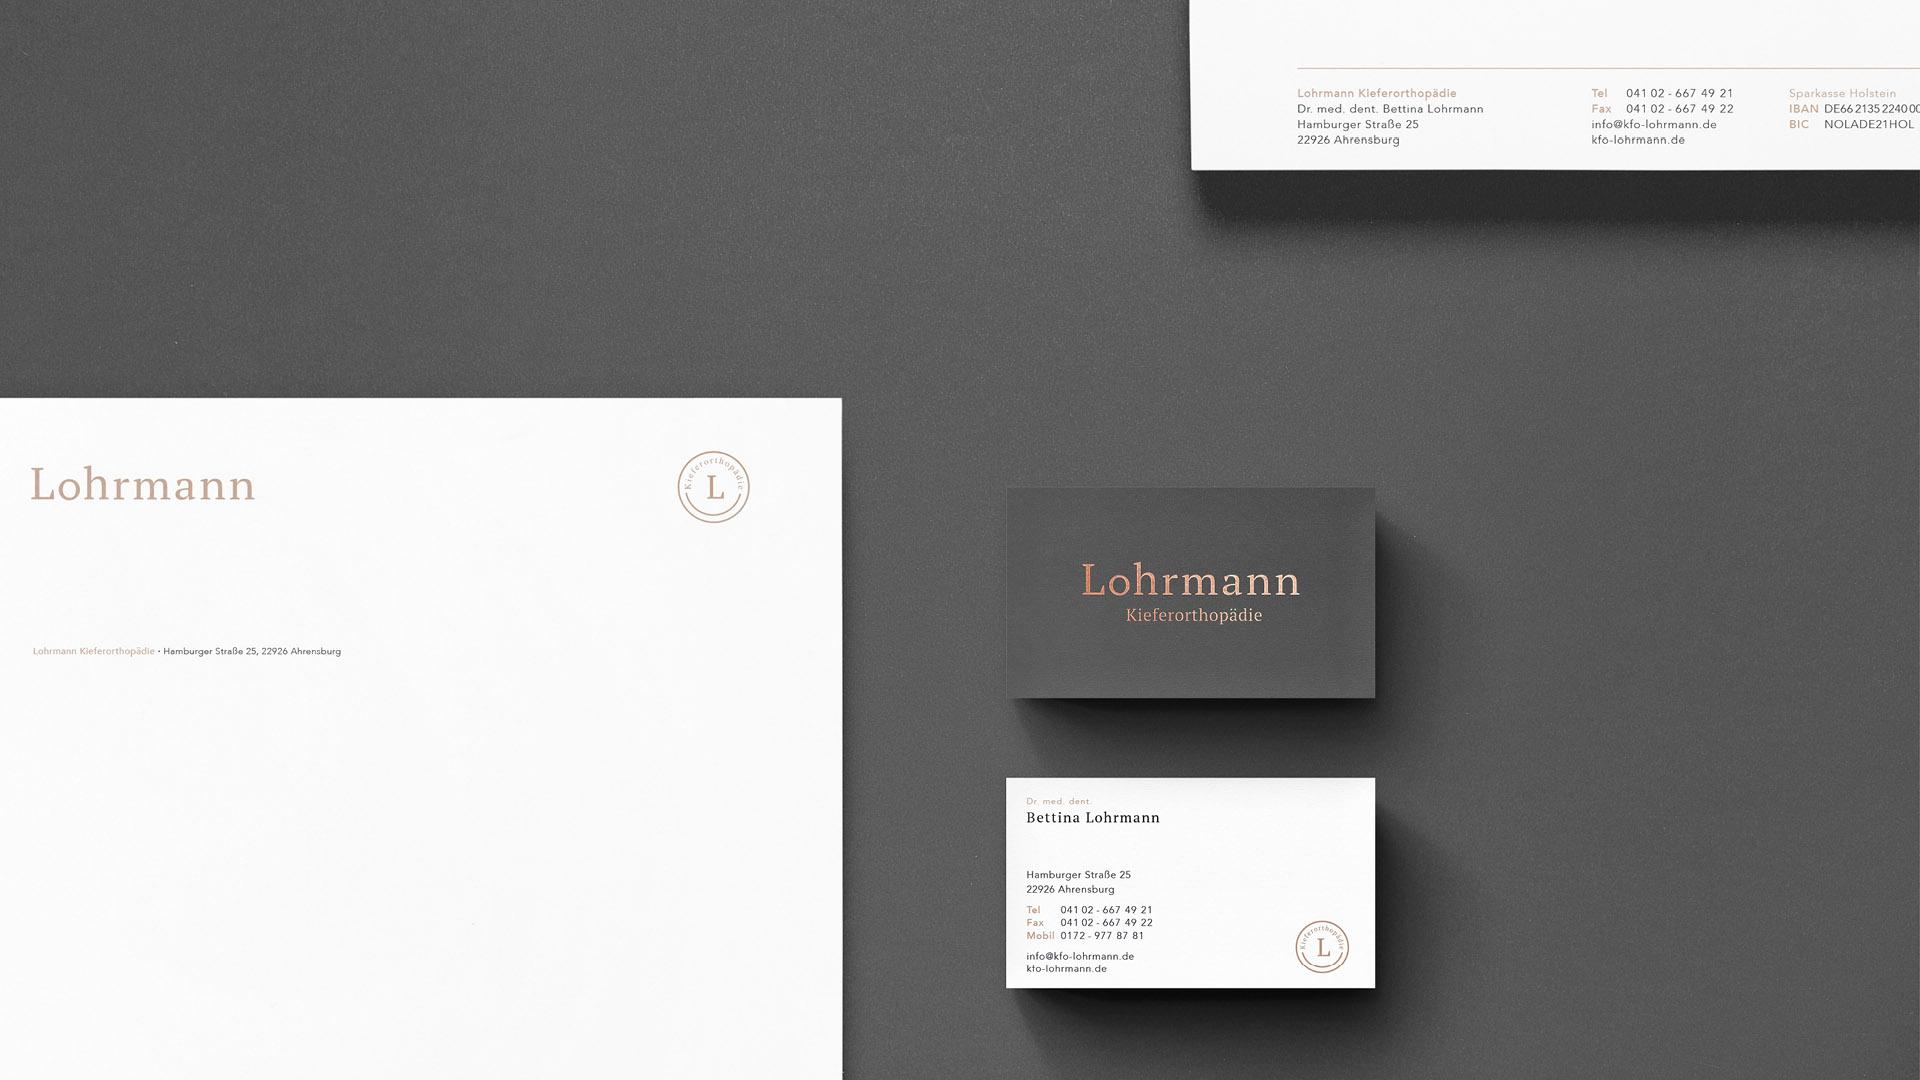 Kieferorthopäde Lohrmann Geschäftsausstattung Design